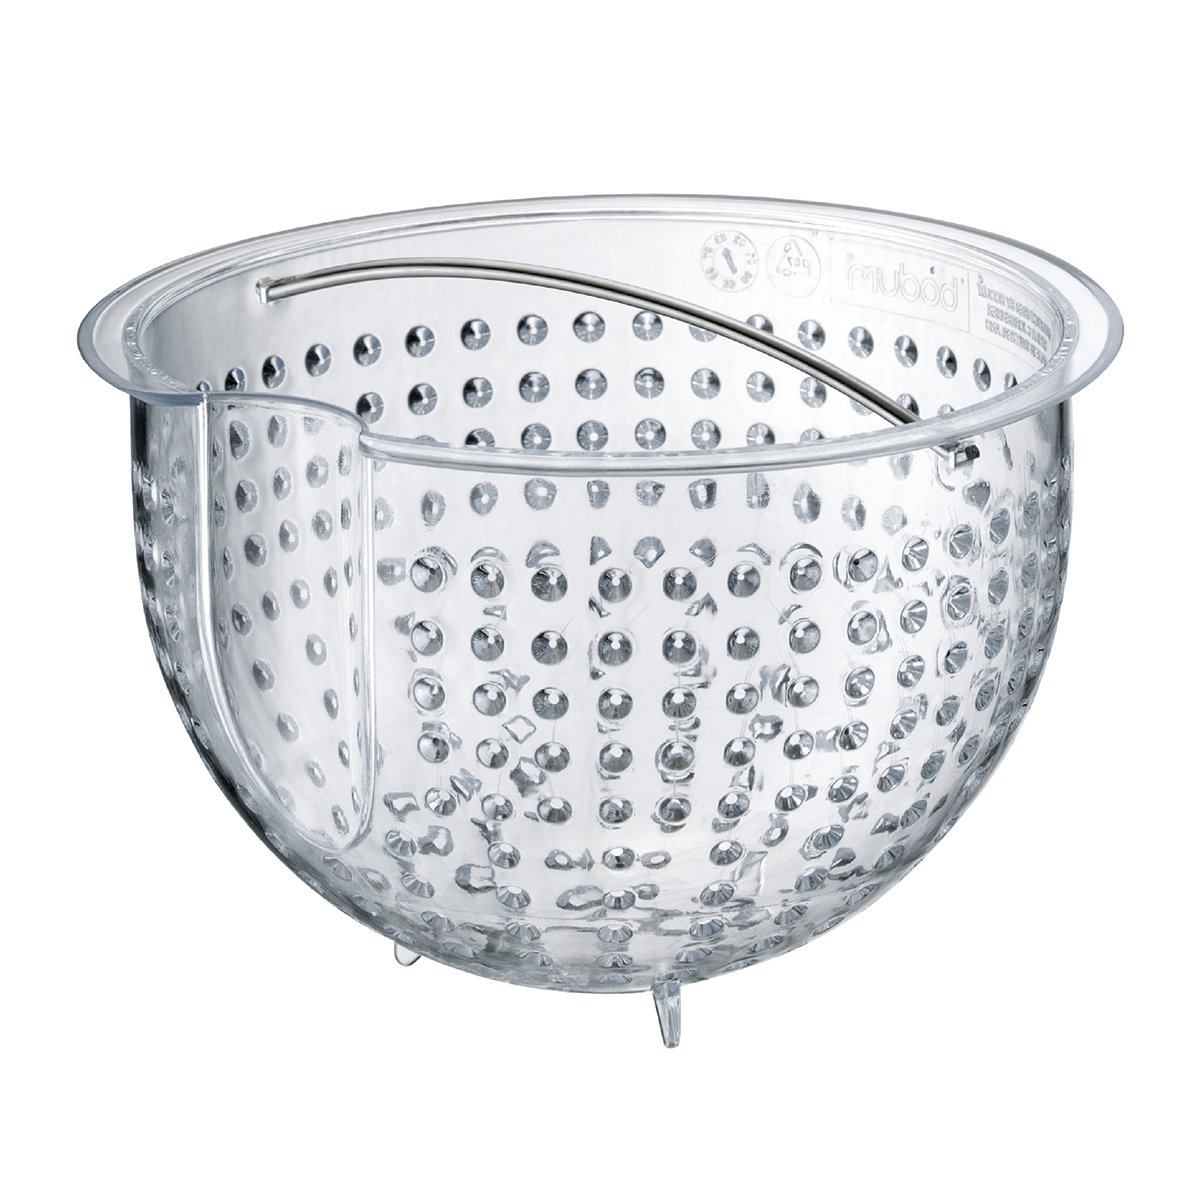 Component 01-1920-10-212 Component Filter For Teapot 1.0 L, Plastic BODUM Chef